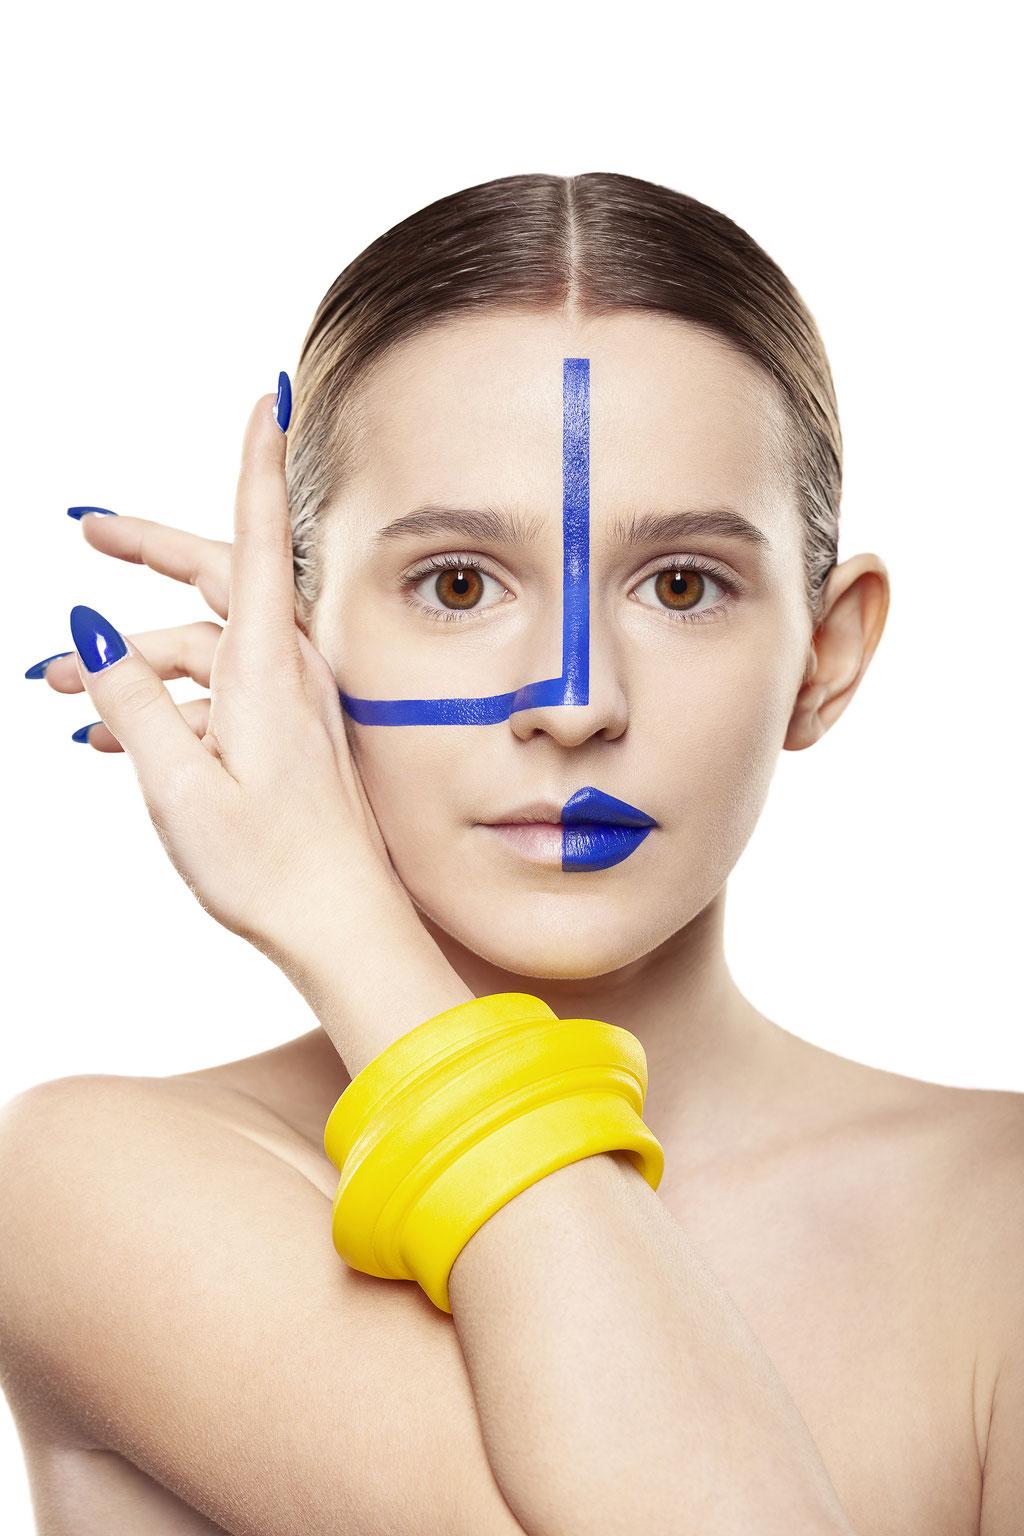 Nobahar Design Milano - contemporary  jewelry - Napoli - Daily wearable design